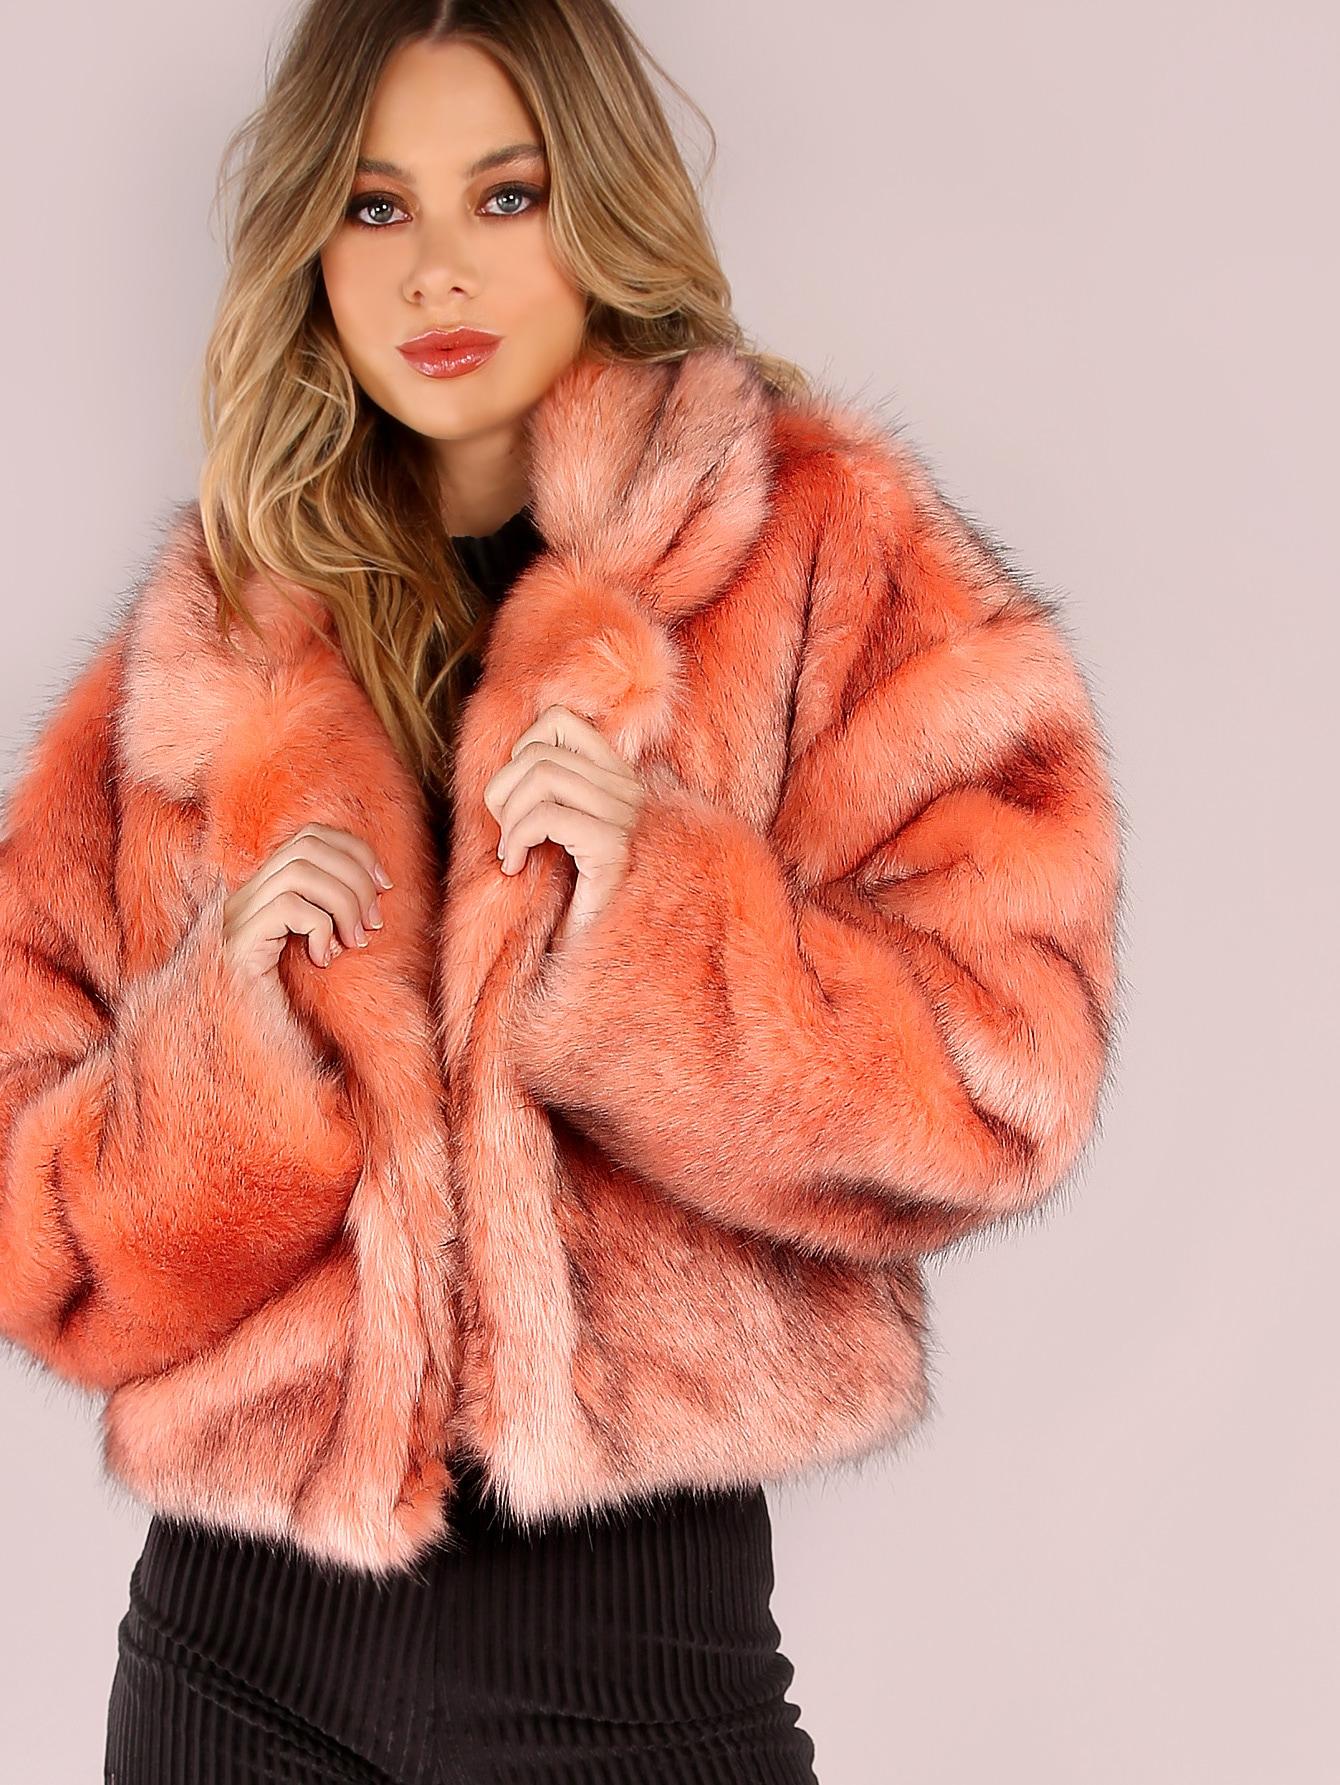 Pink Stand Collar Open Front Faux Fur Coat -SheIn(Sheinside)